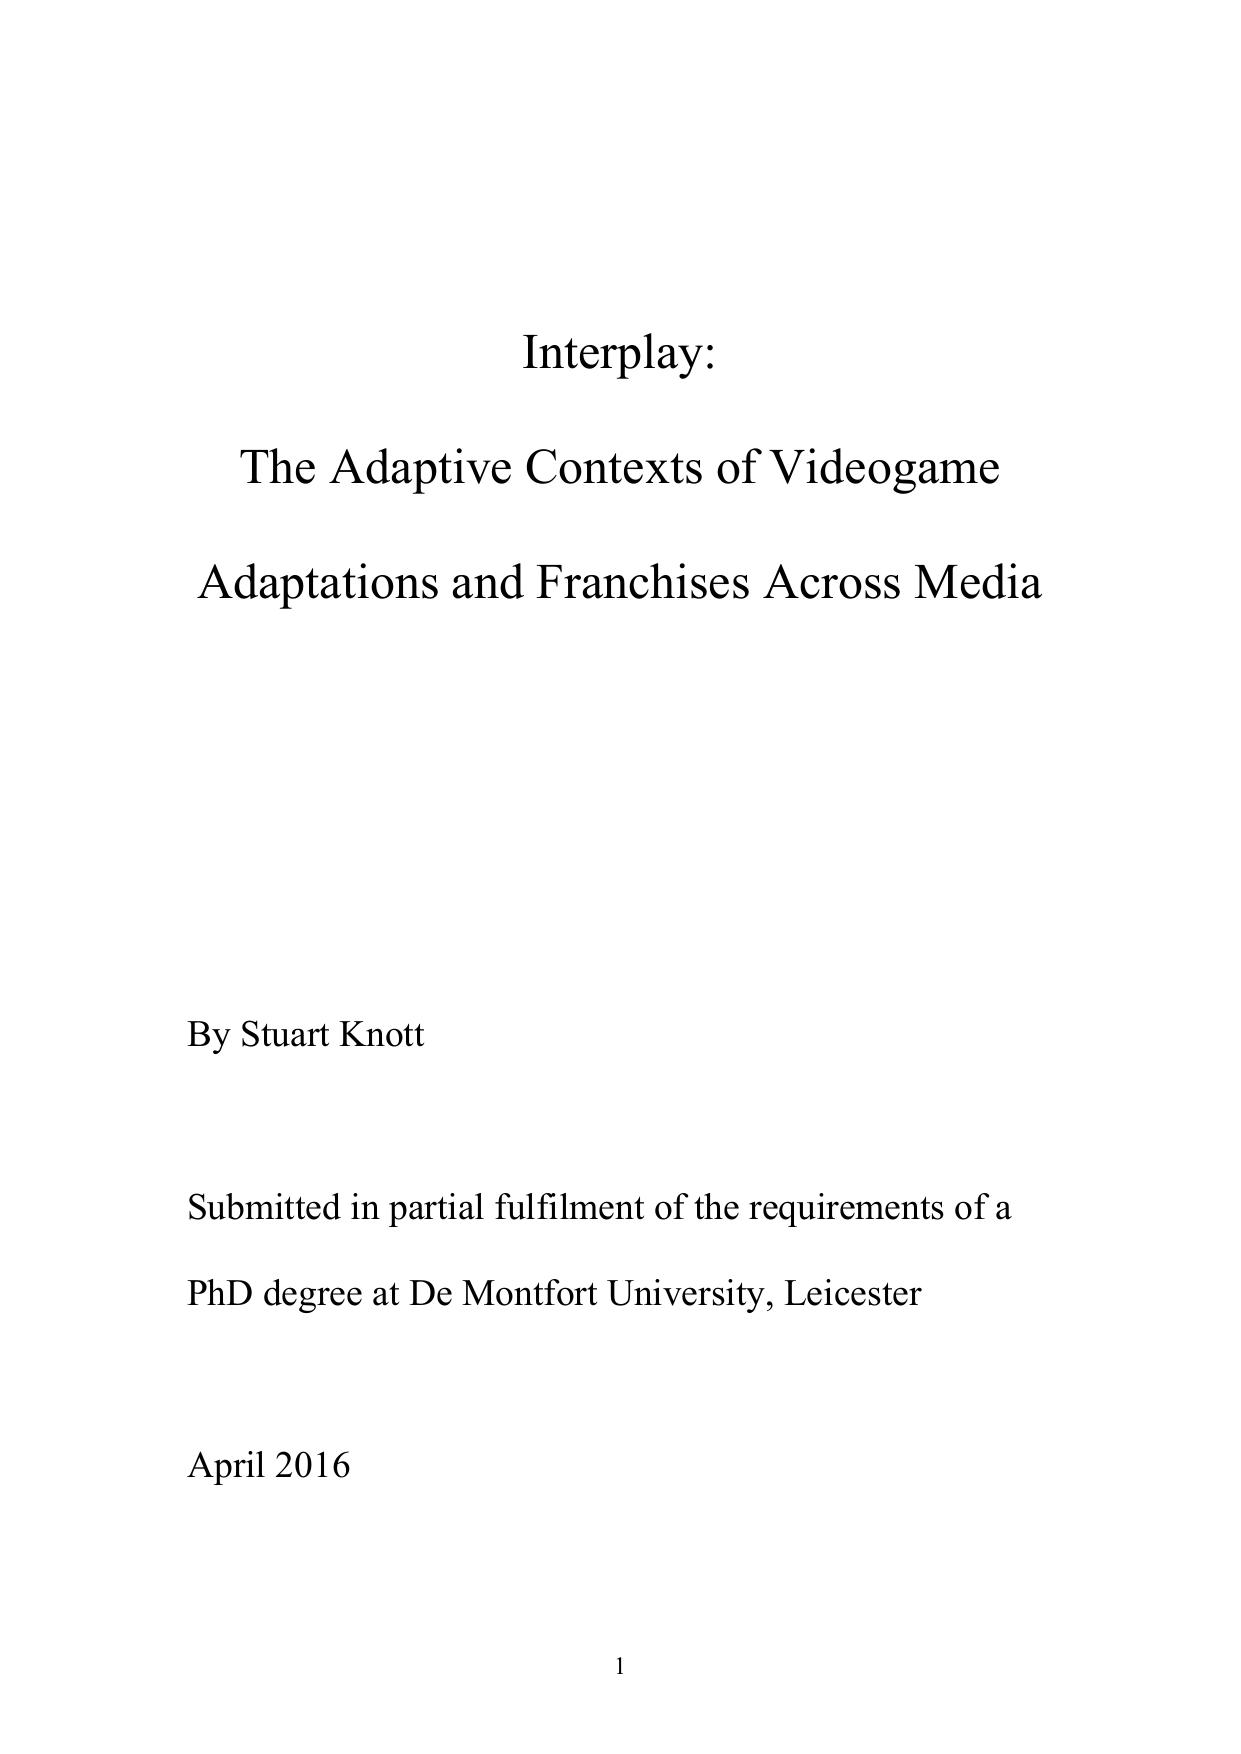 Interplay: The Adaptive Contexts of Videogame | manualzz com